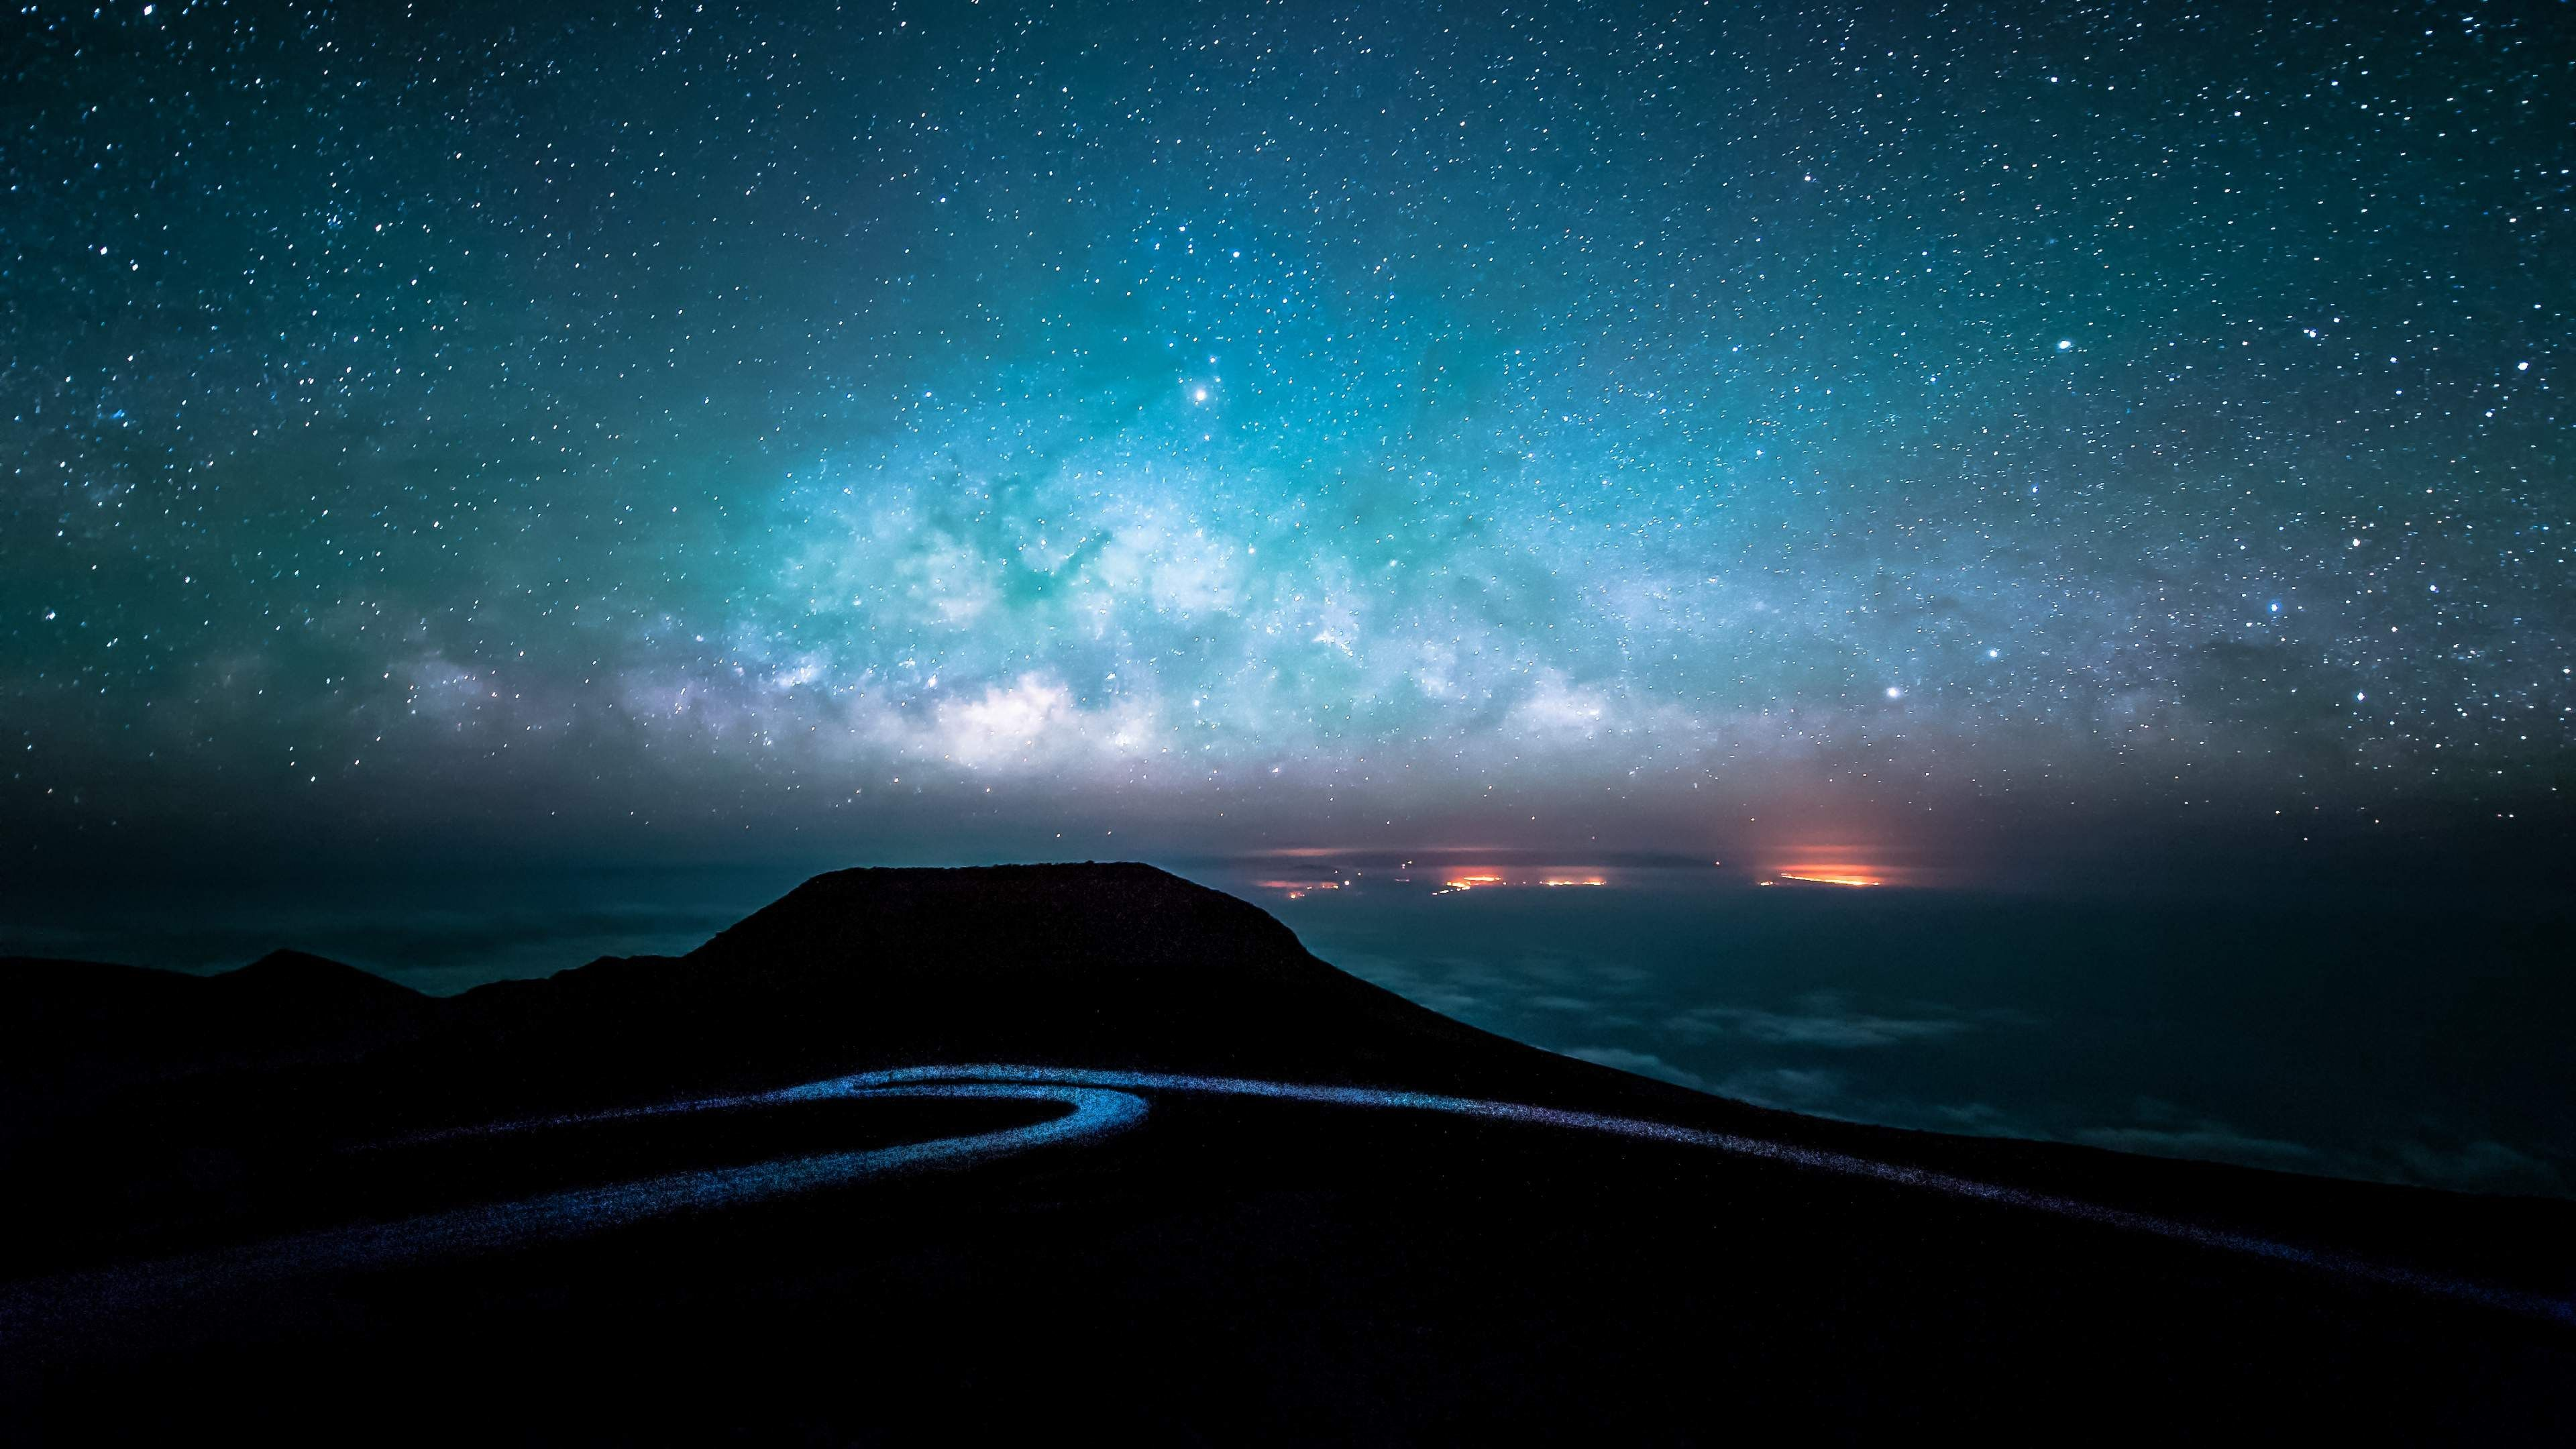 night road and starry sky 4k ultra hd wallpaper Night